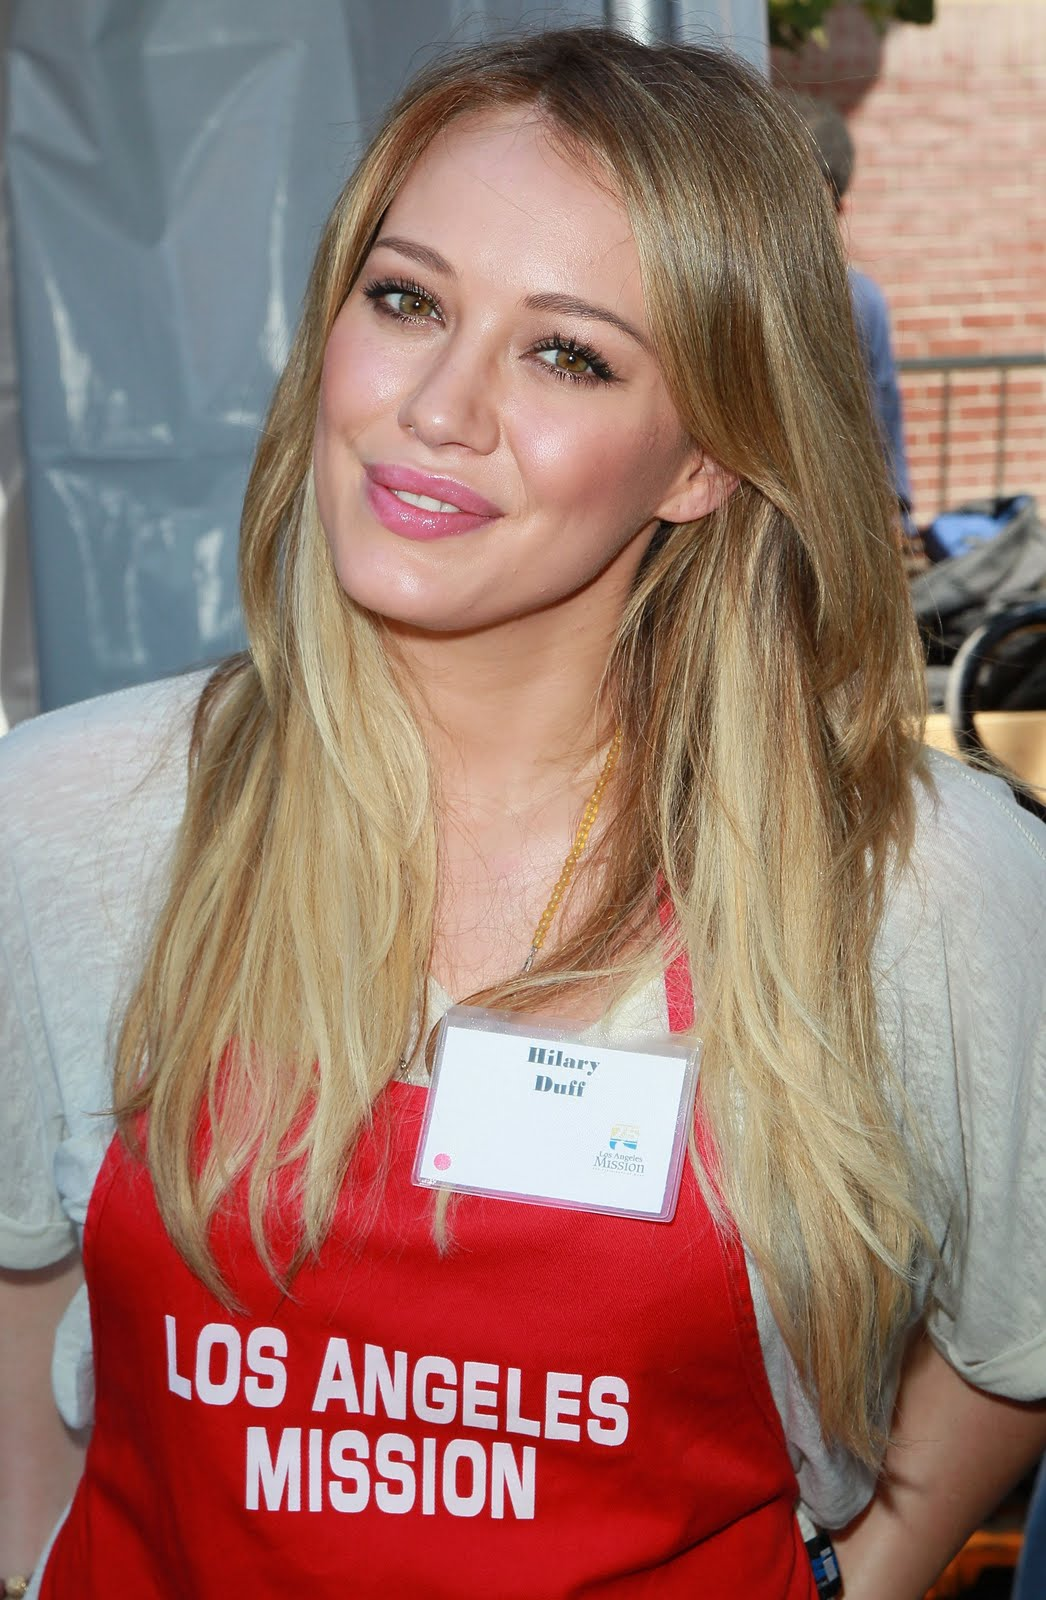 Hot Photos Celebrity: Hilary Duff Hilary Duff Songs